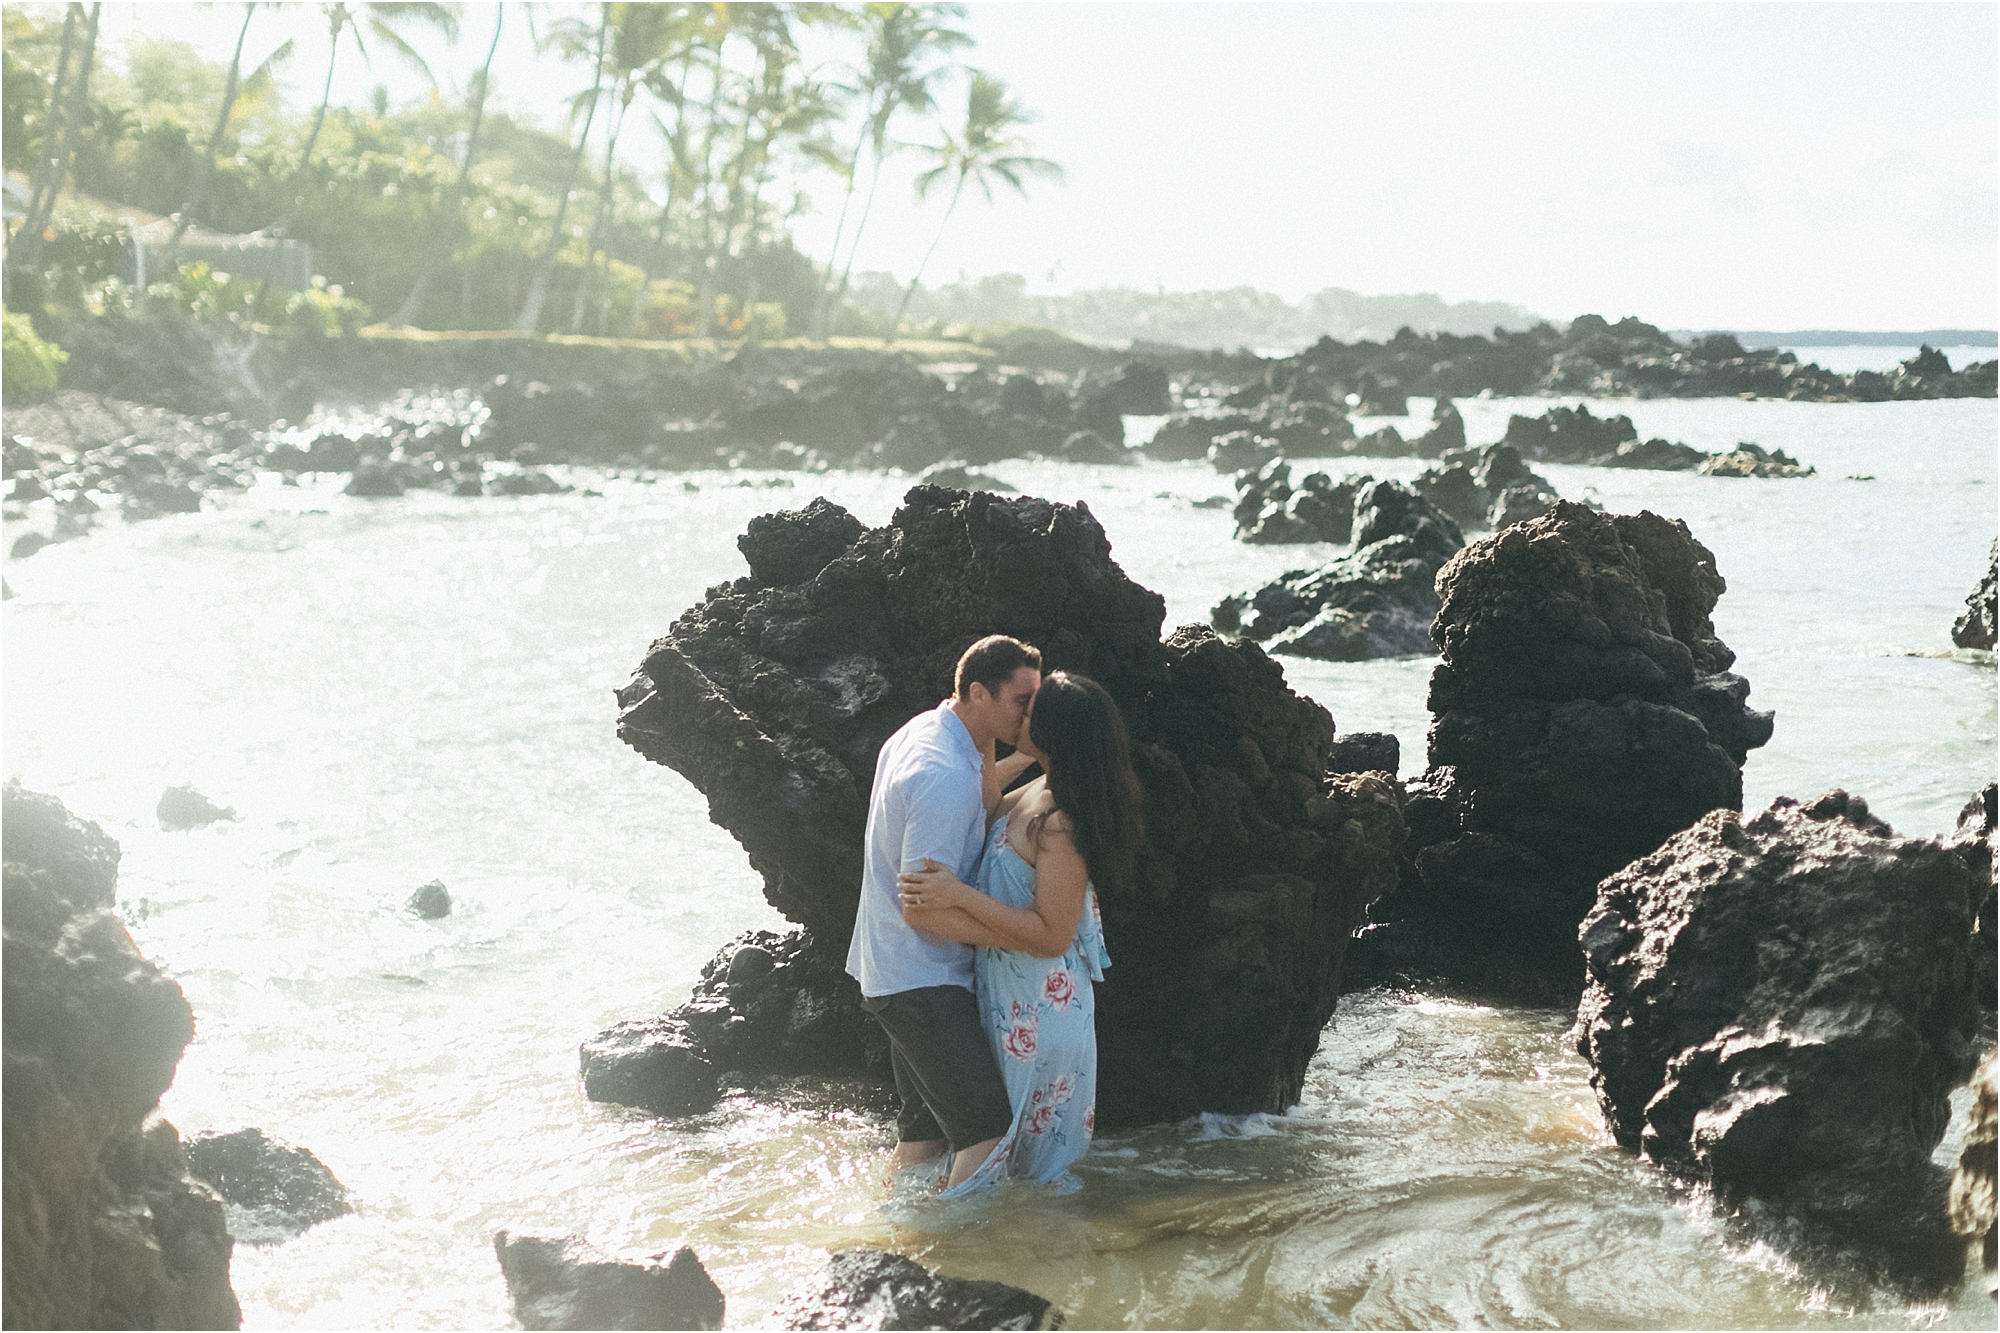 angie-diaz-photography-maui-hawaii-engagement-wedding-photographer_0007.jpg